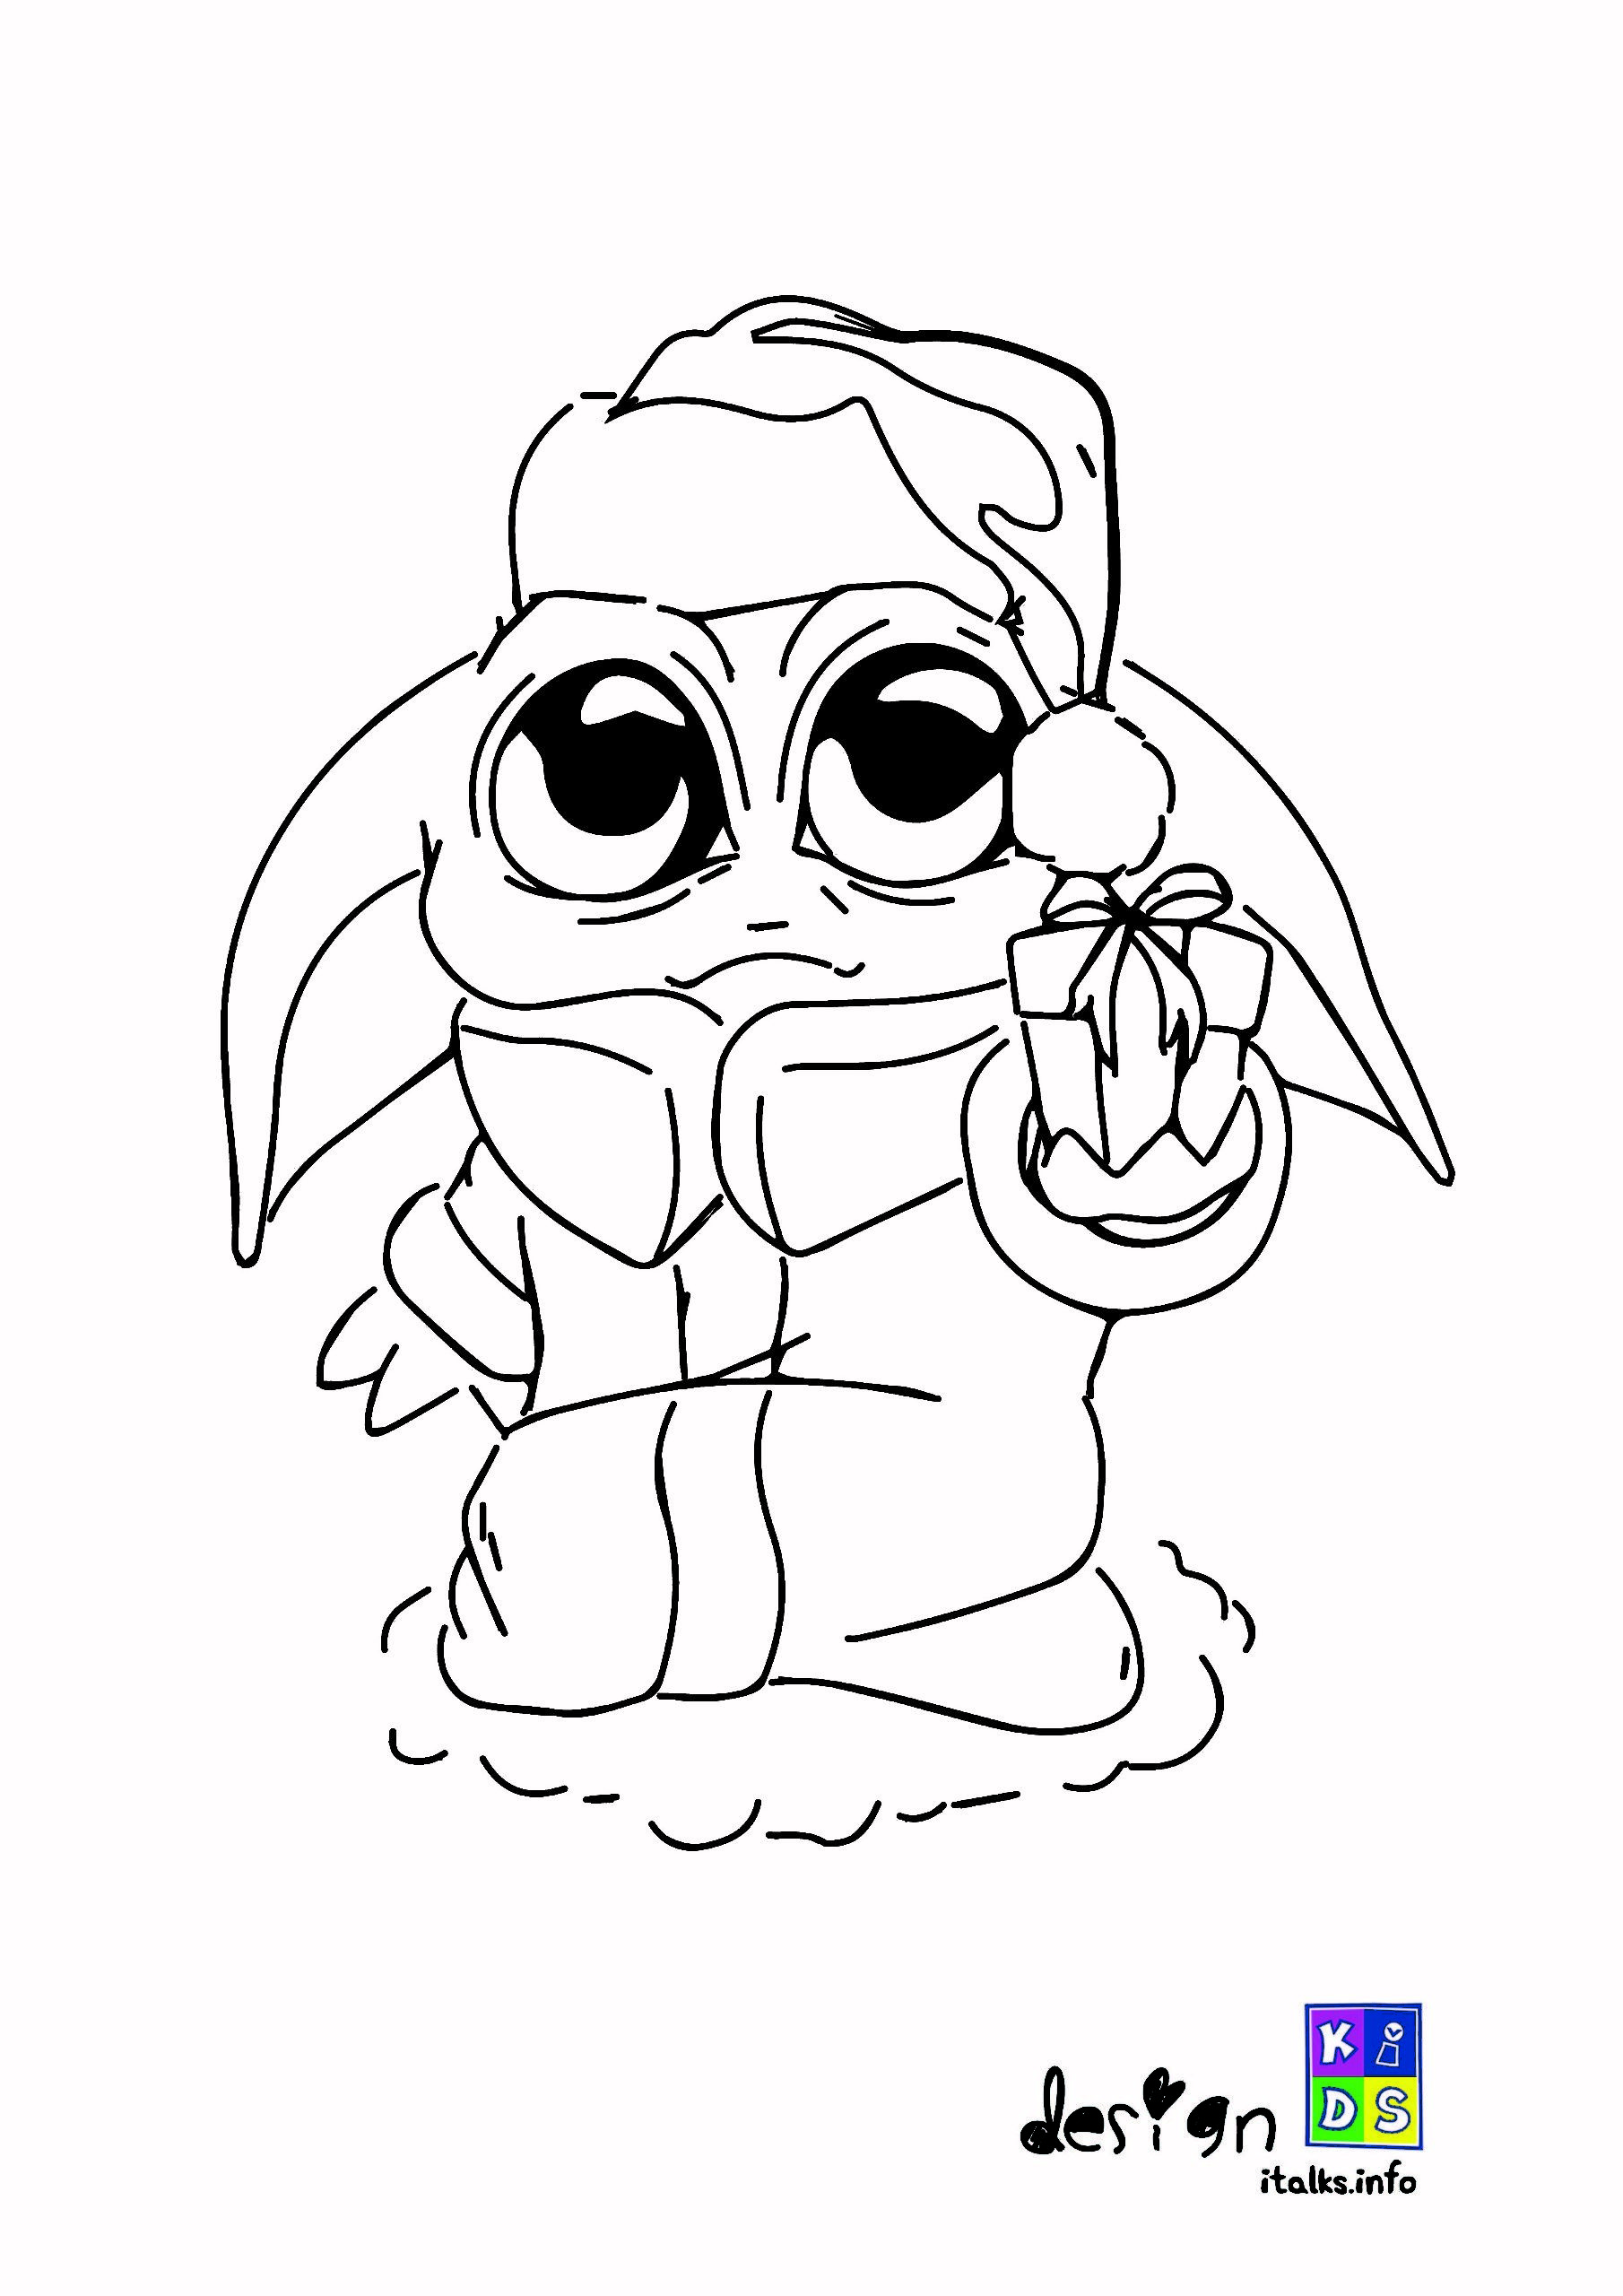 Coloring Pages Baby Yoda The Mandalorian And Baby Yoda Free Coloring Pages Stitch Coloring Pages Yoda Drawing